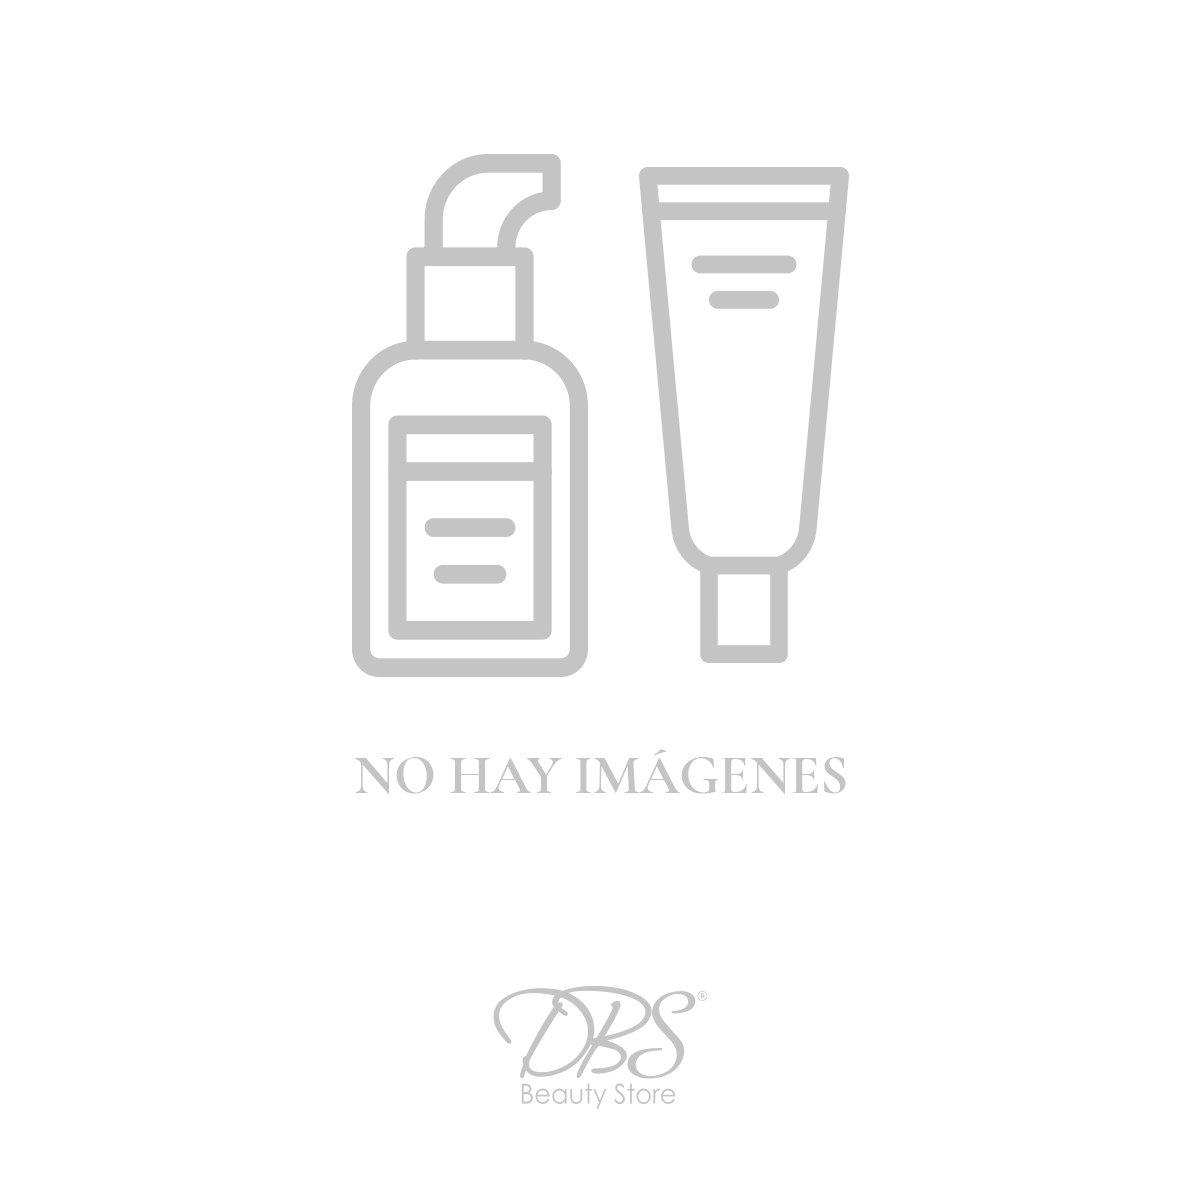 makeup-revolution-RT-31521.jpg